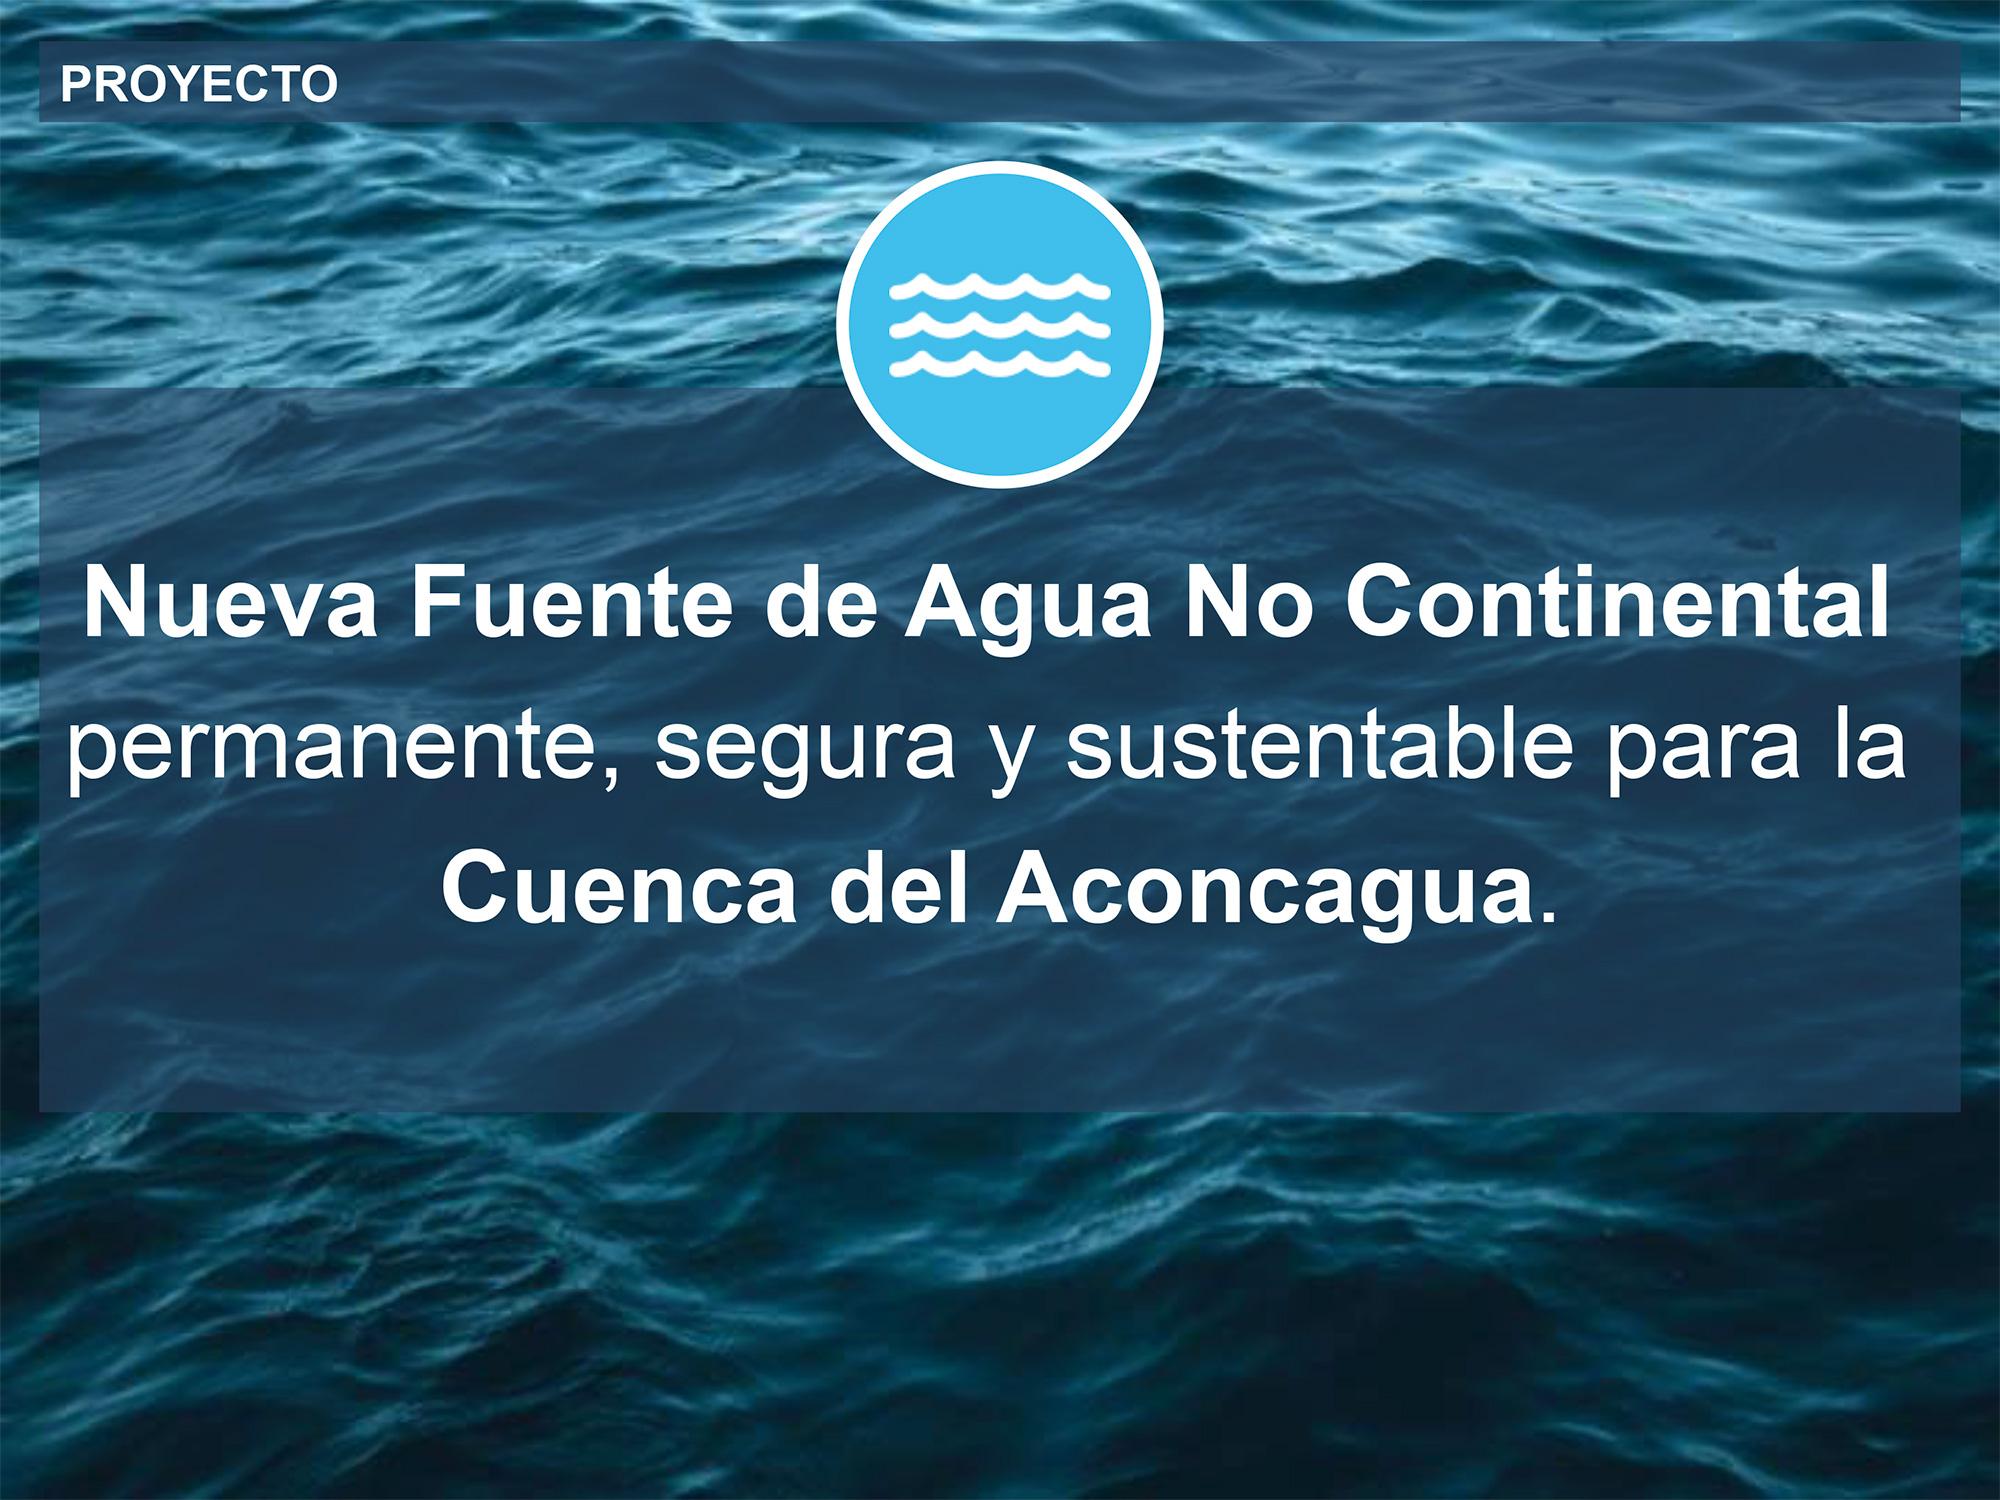 AP_Proyecto_Aconcagua-6.jpg